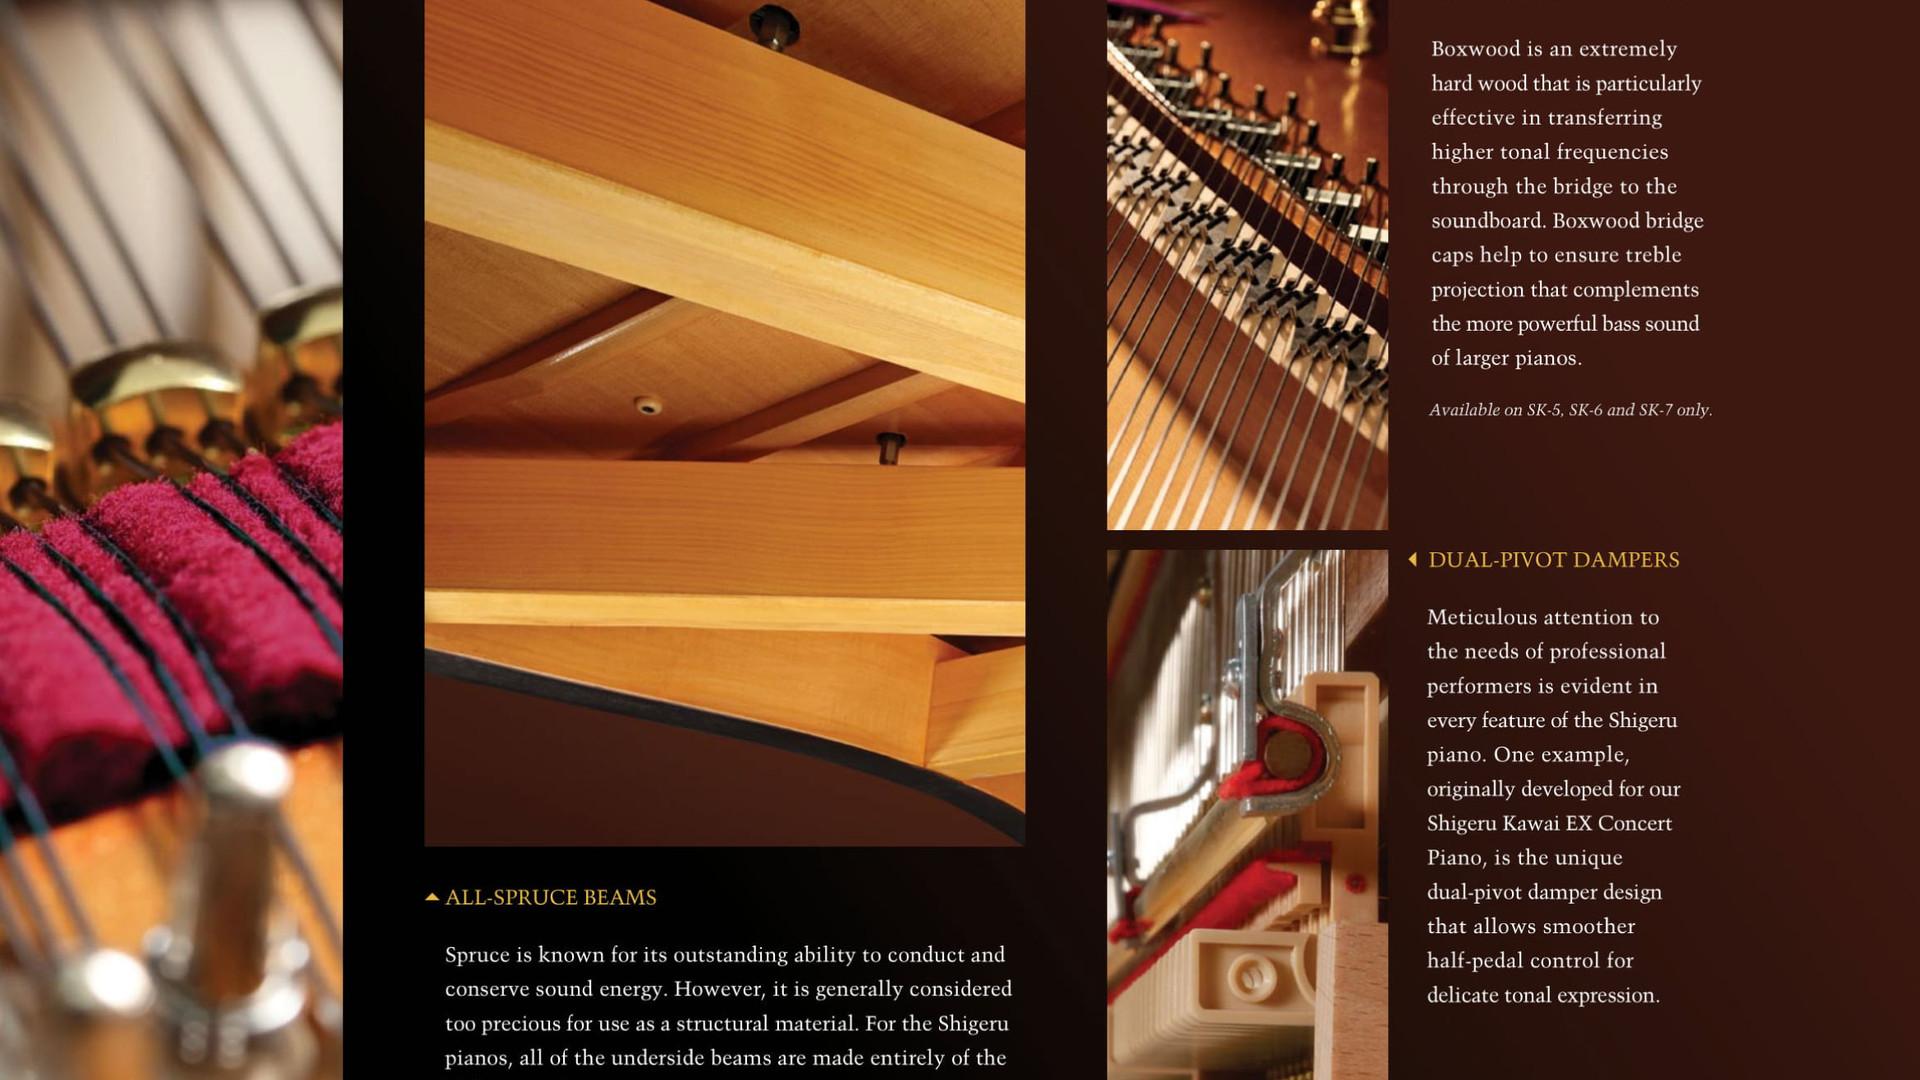 EX-Concert-Grand-Brochure-18.jpg